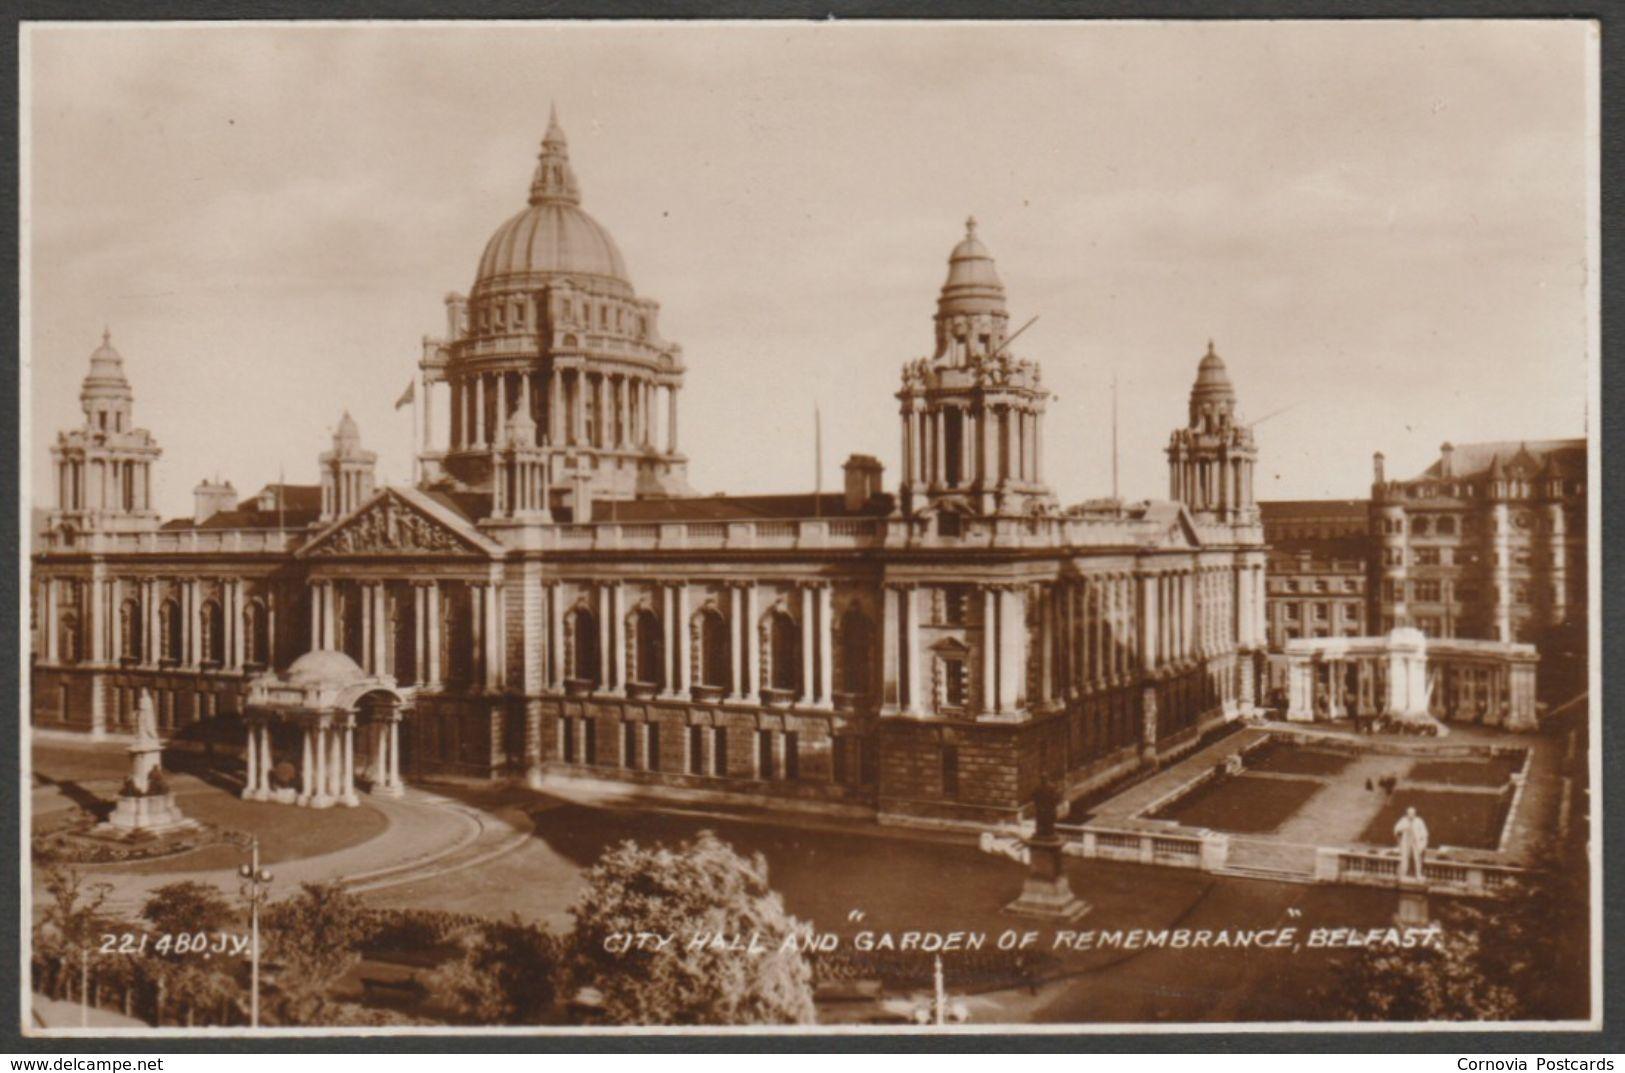 City Hall & Garden of Remembrance, Belfast, 1934 - Valentine\'s RP ...